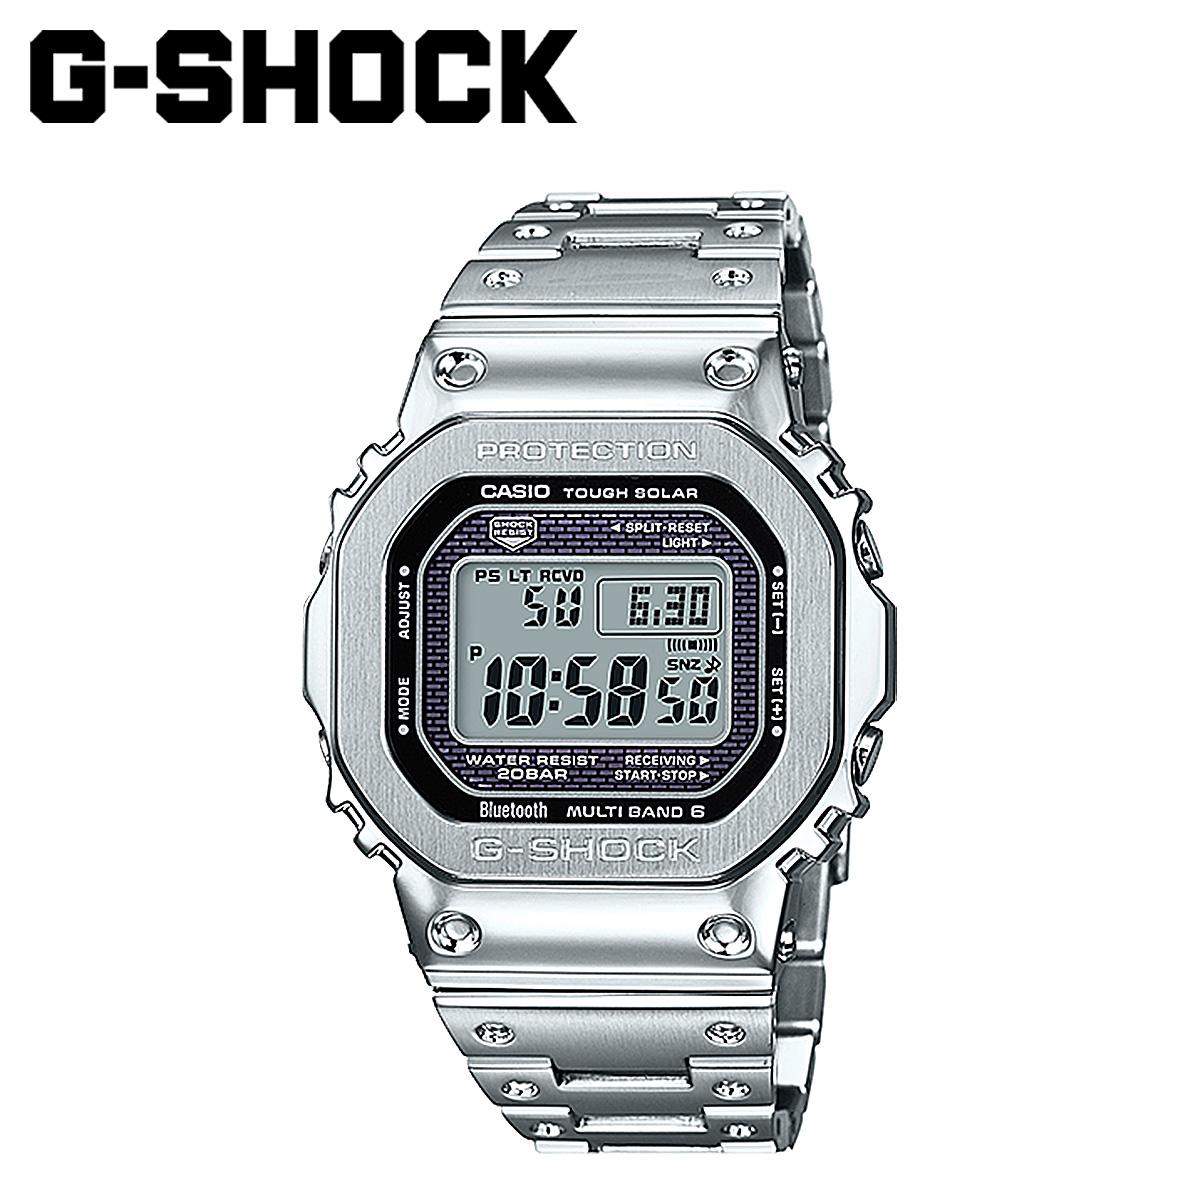 CASIO カシオ G-SHOCK 腕時計 GMW-B5000D-1JF ORIGIN 35周年 メンズ レディース シルバー